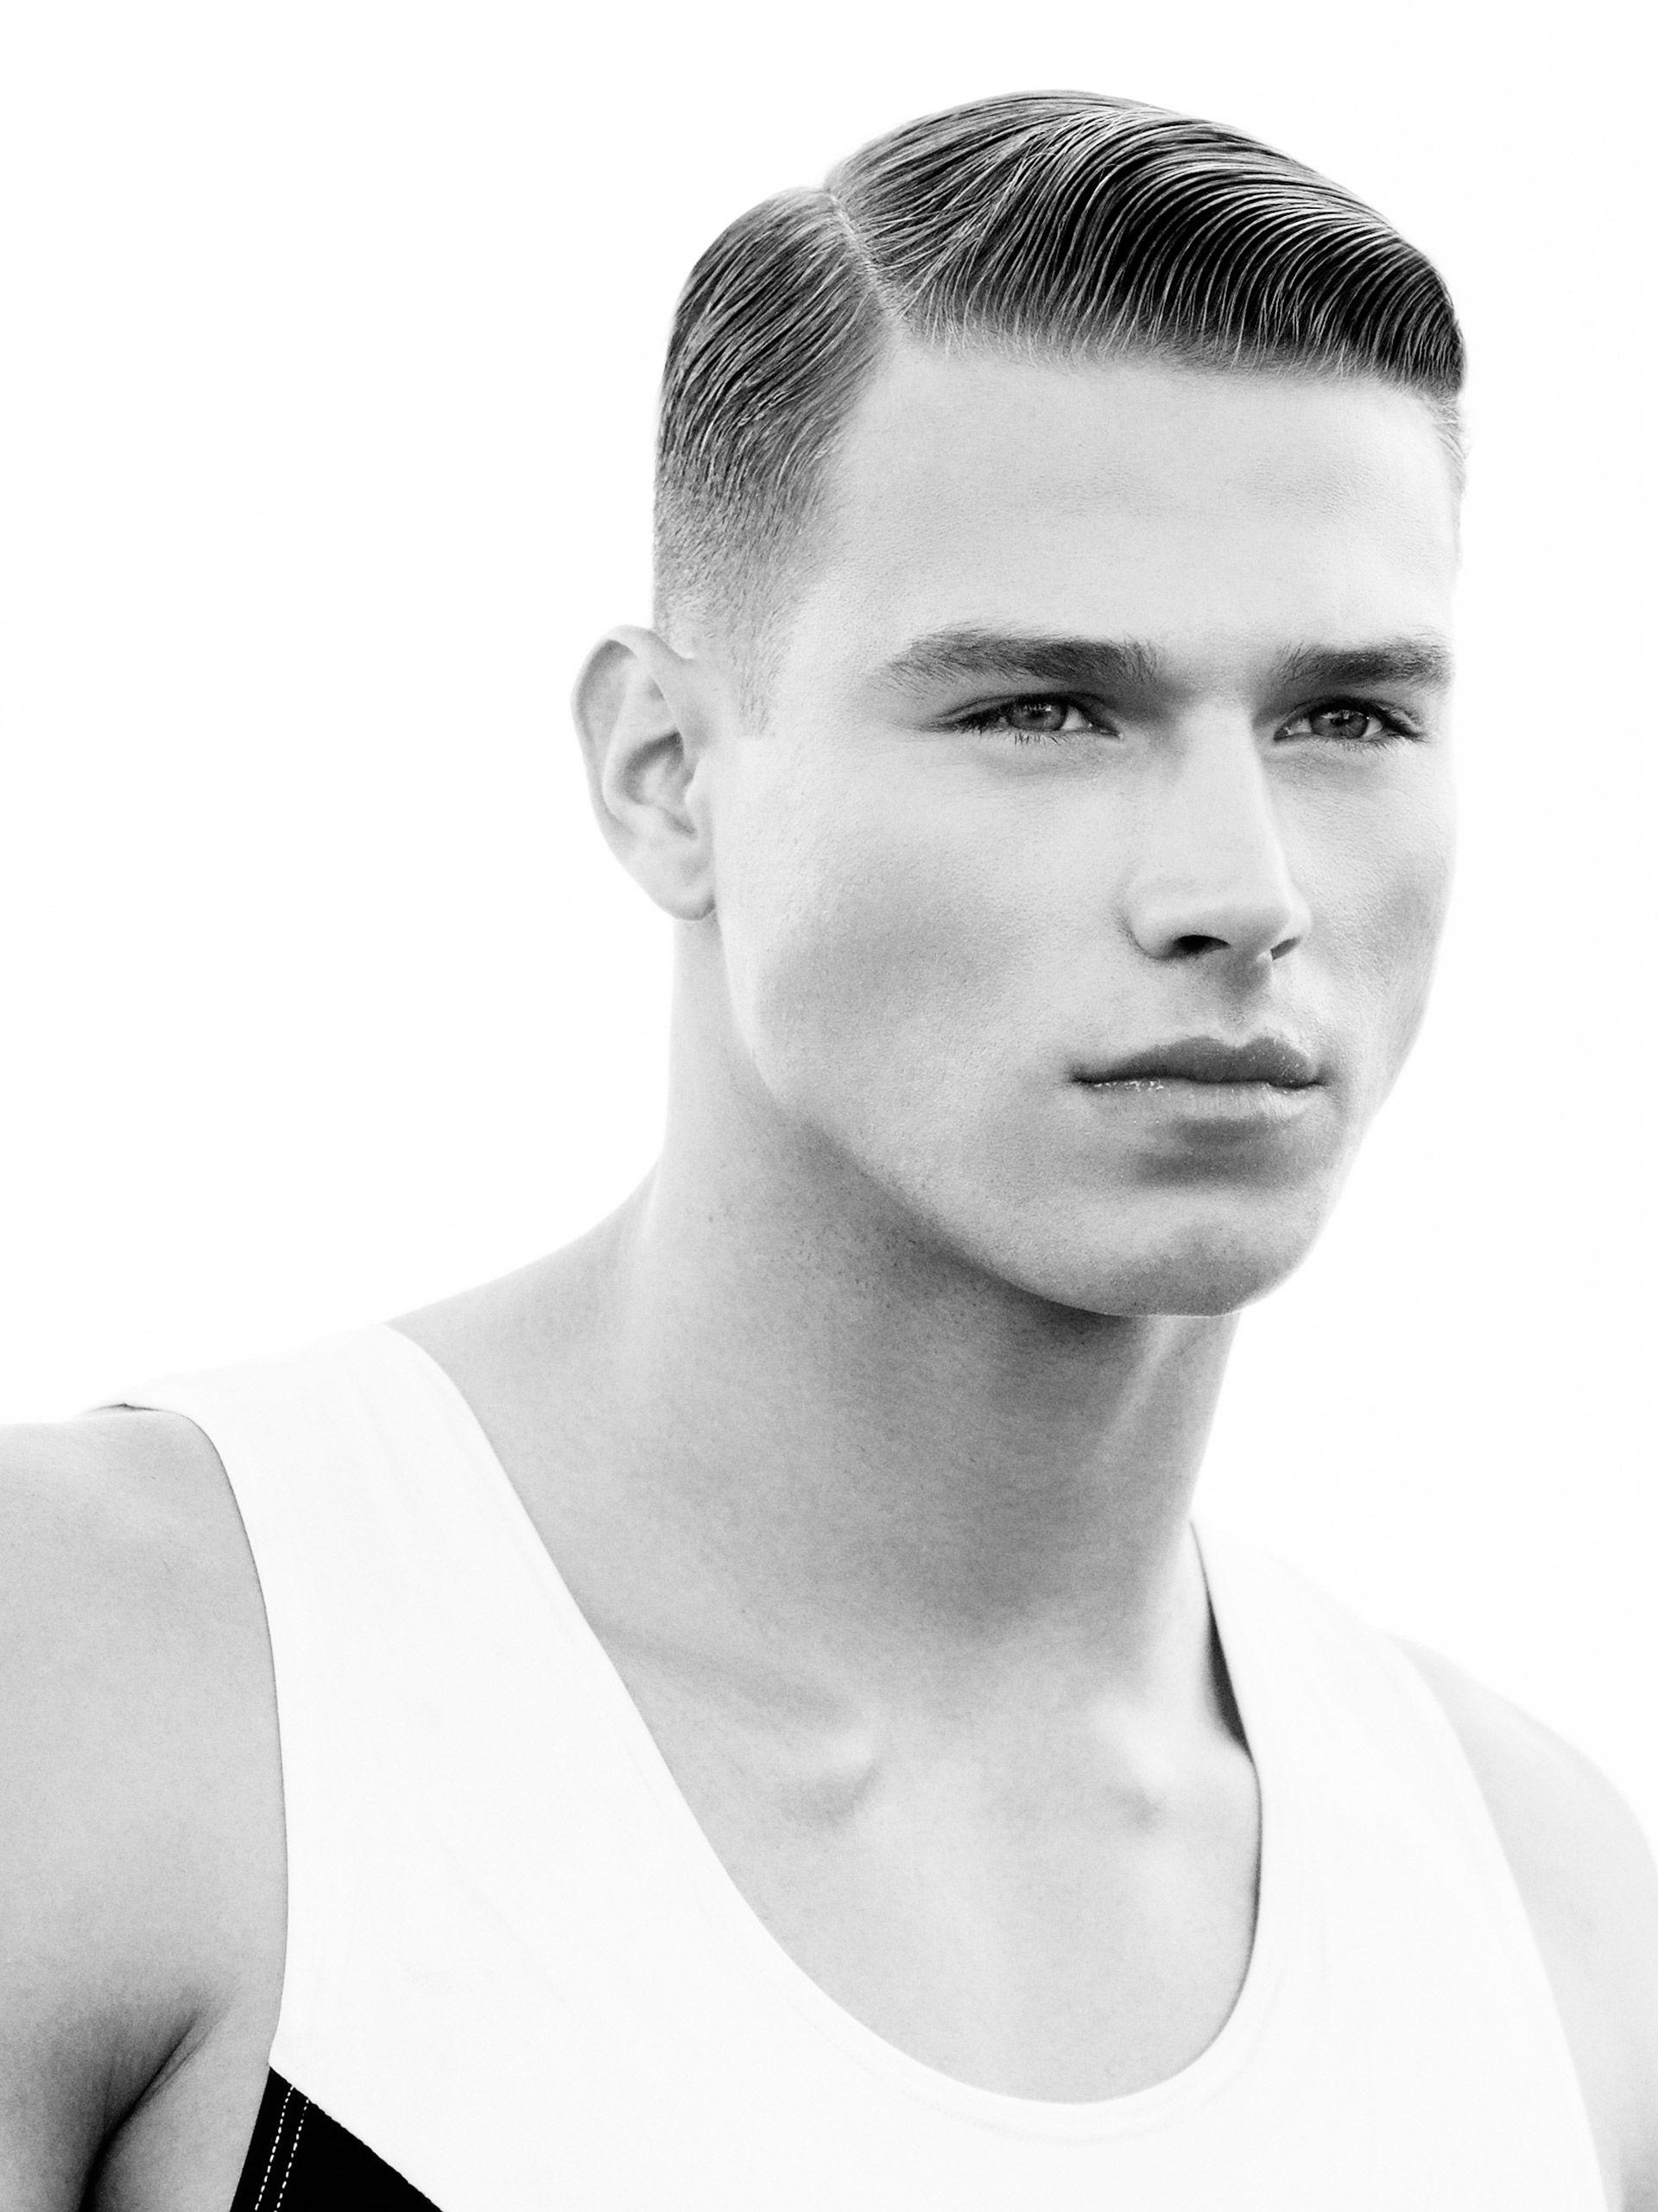 American Crew Military Haircut Haircuts For Men